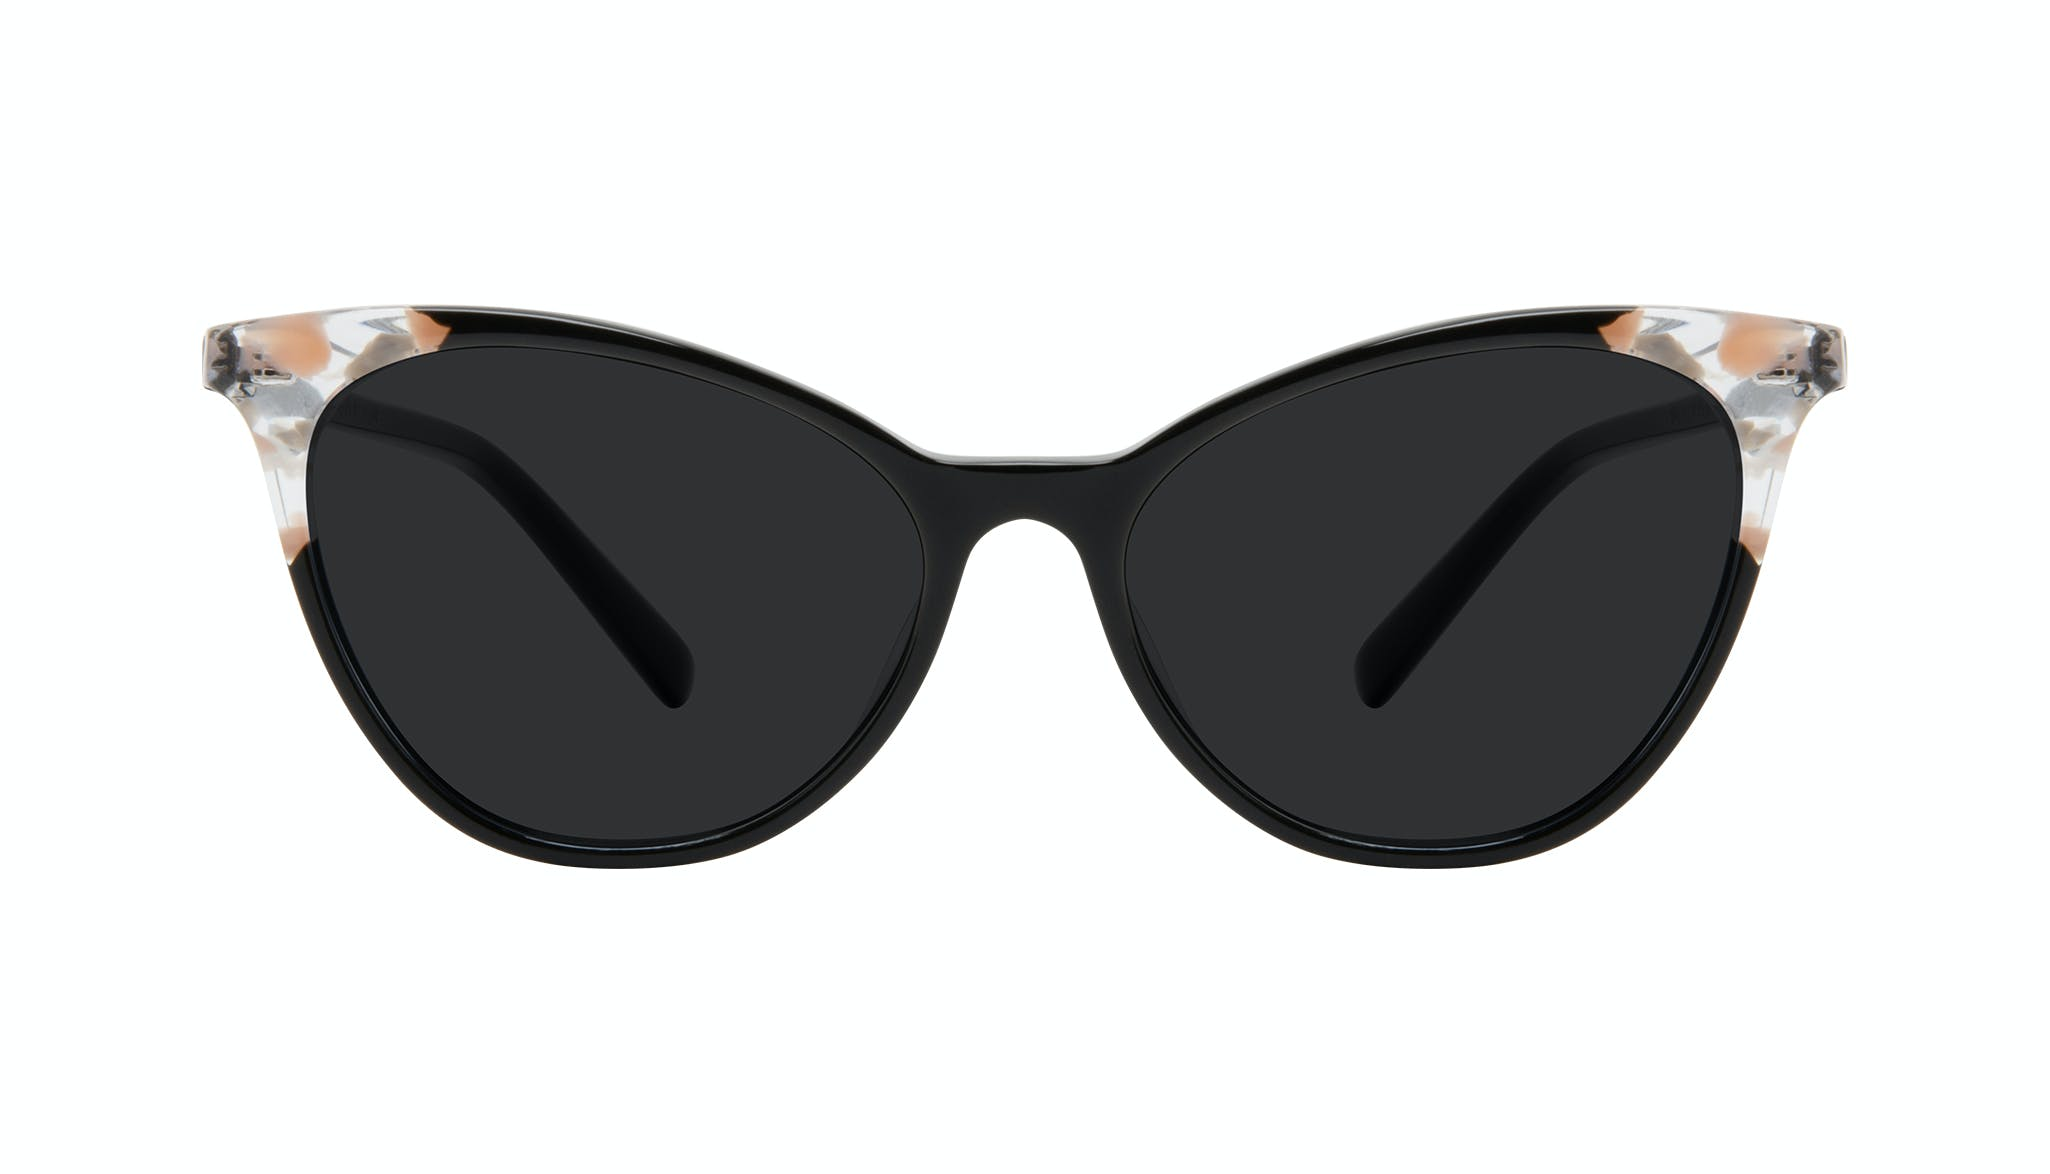 Affordable Fashion Glasses Cat Eye Eyeglasses Women Unreal Black Stone